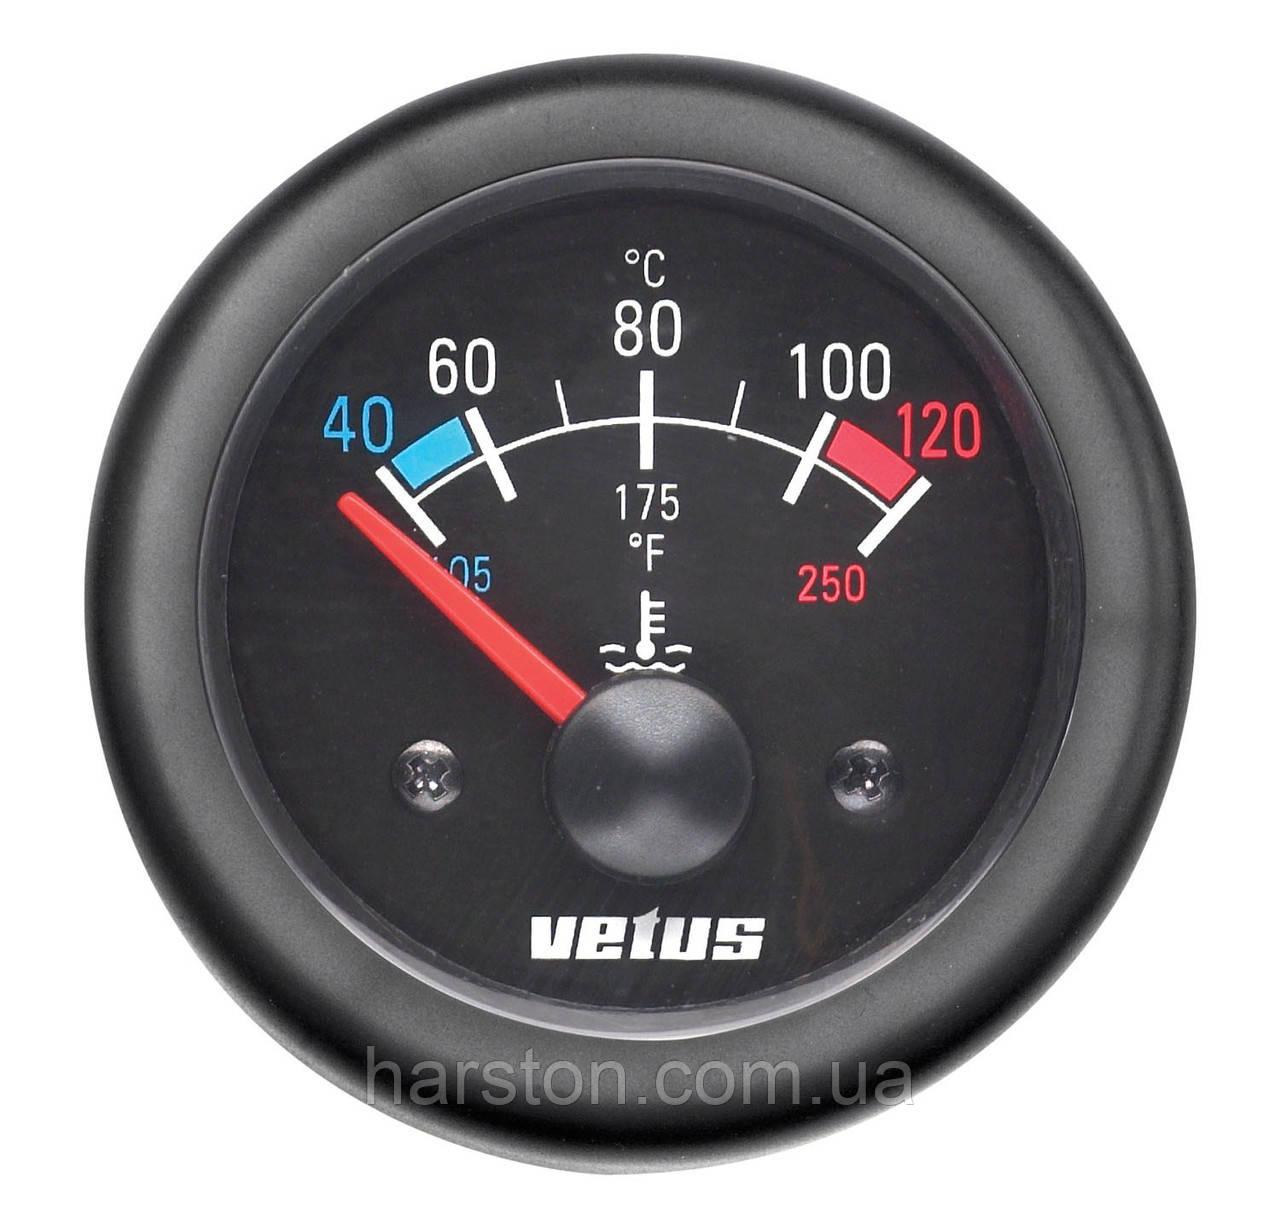 Индикатор температуры VETUS TEMPB